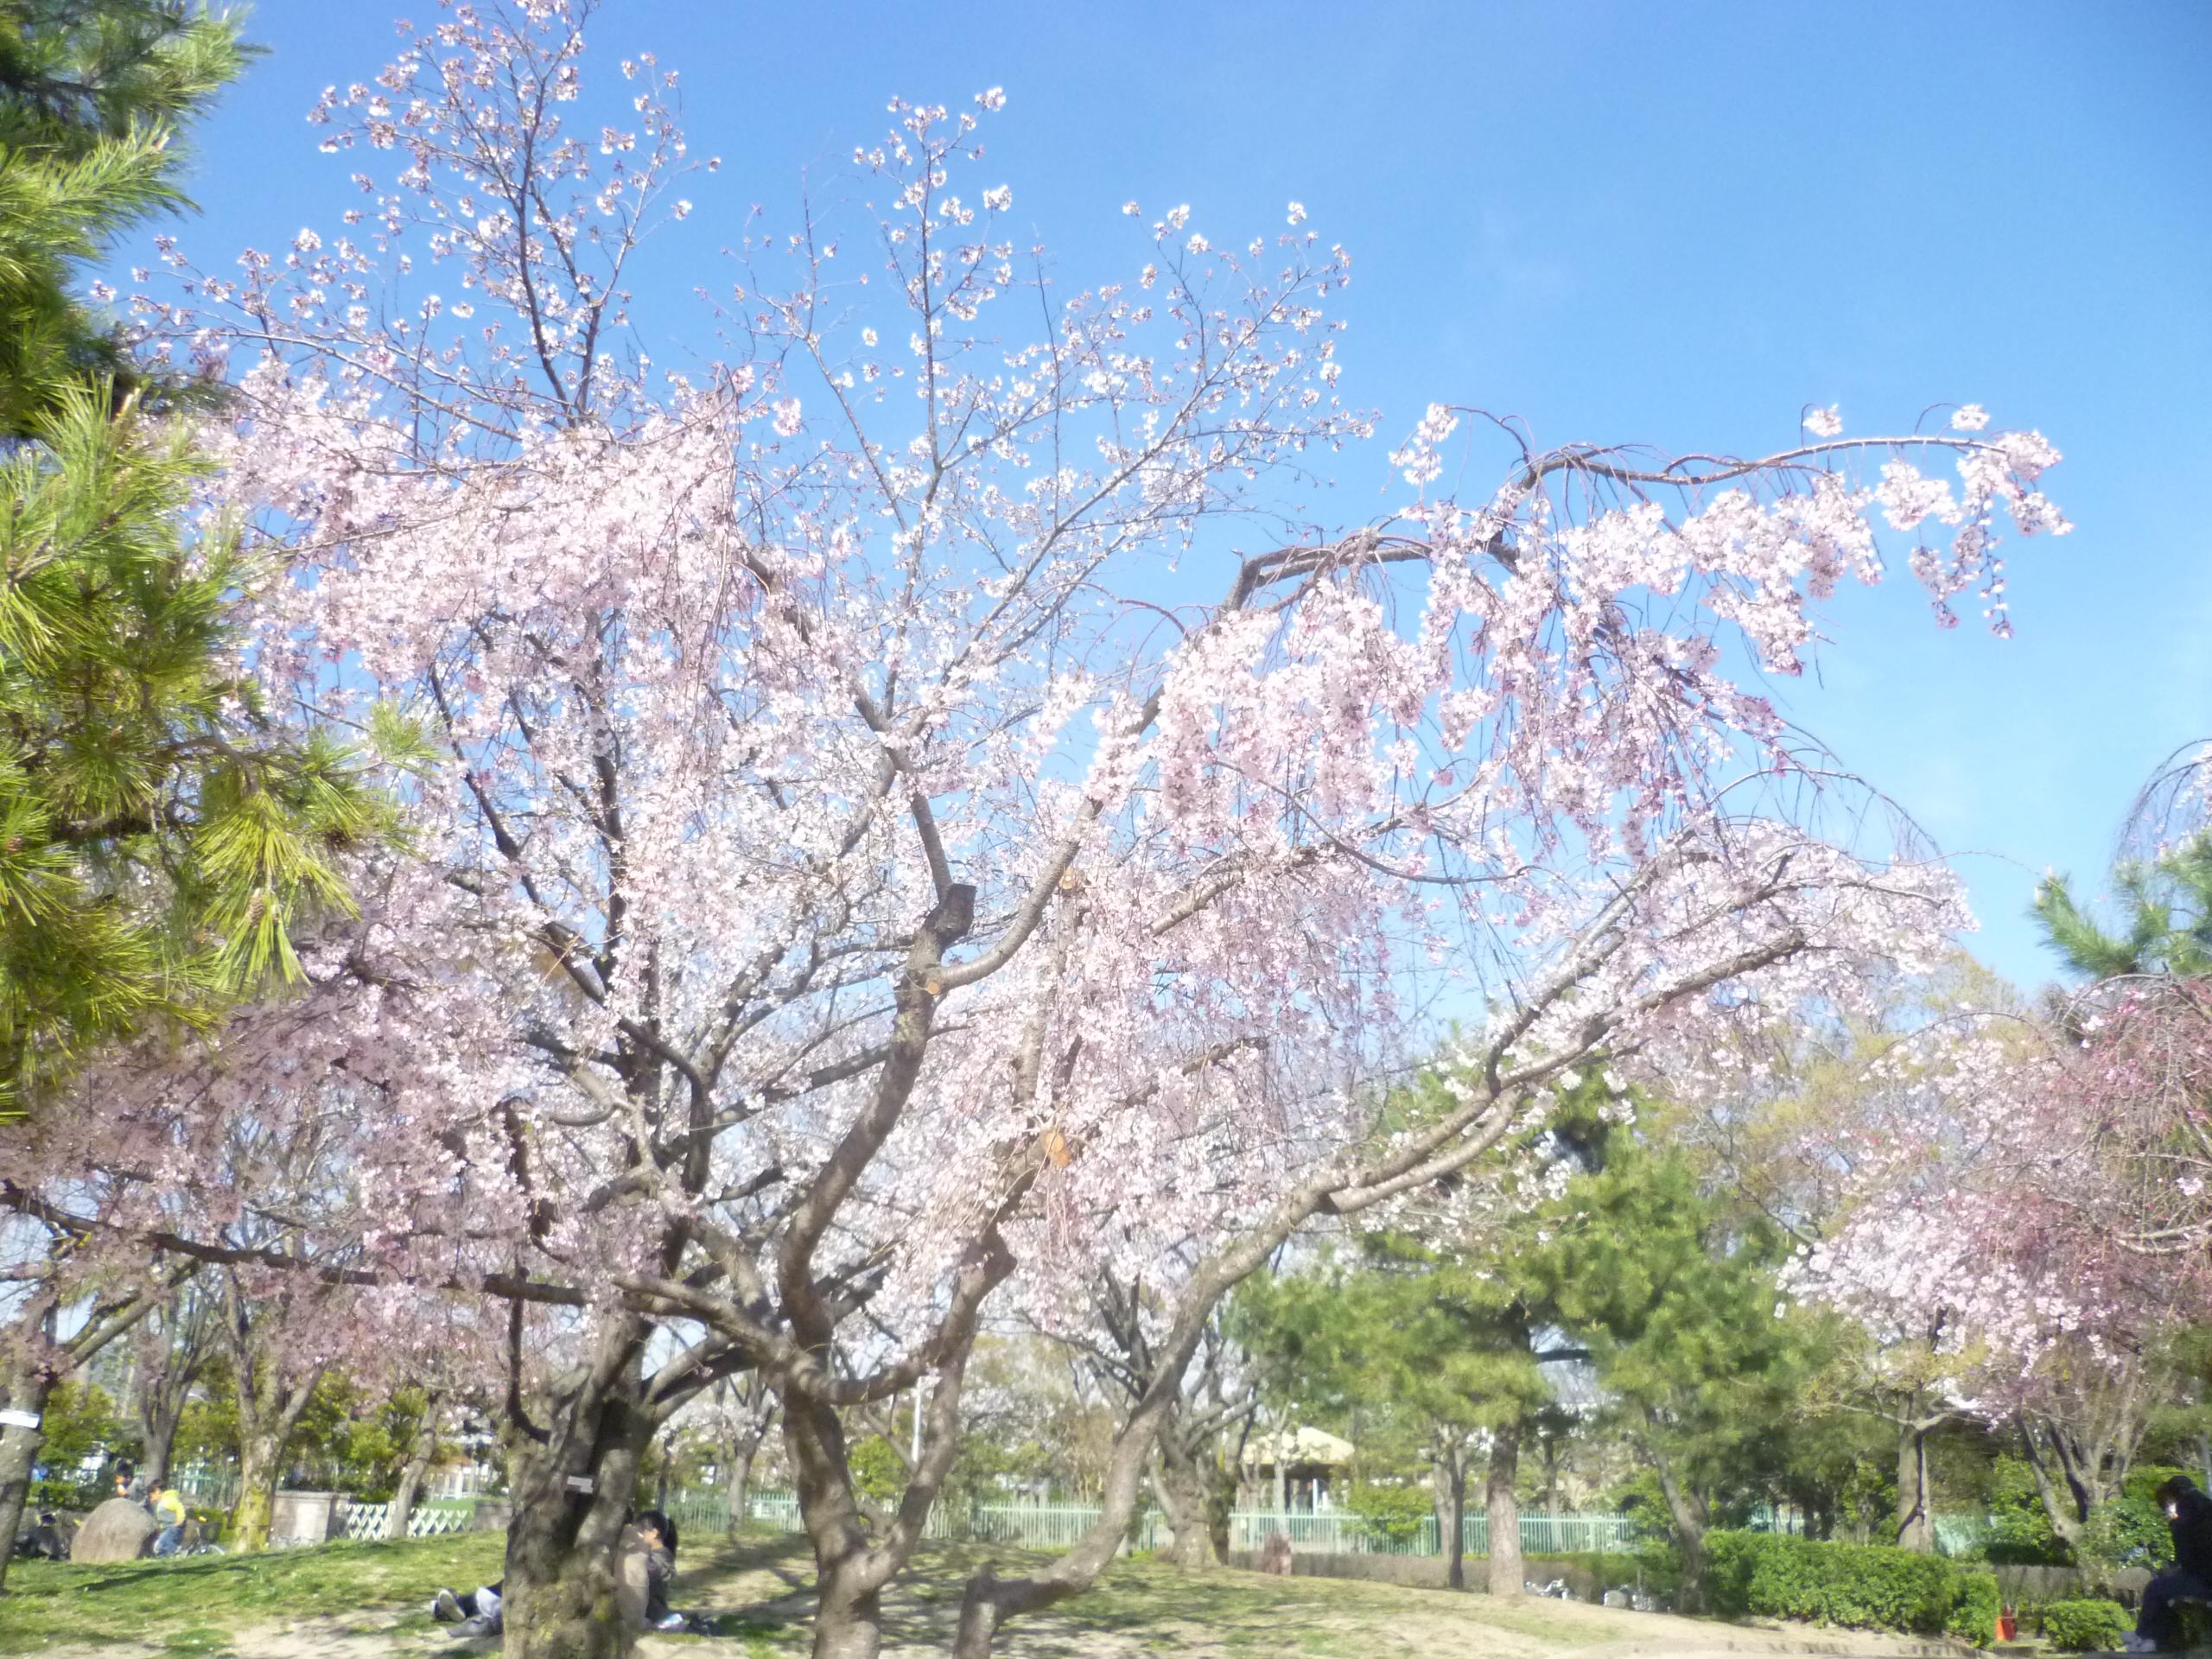 http://www.supercourt.jp/blog/kawanishi/%E6%A1%9C.JPG